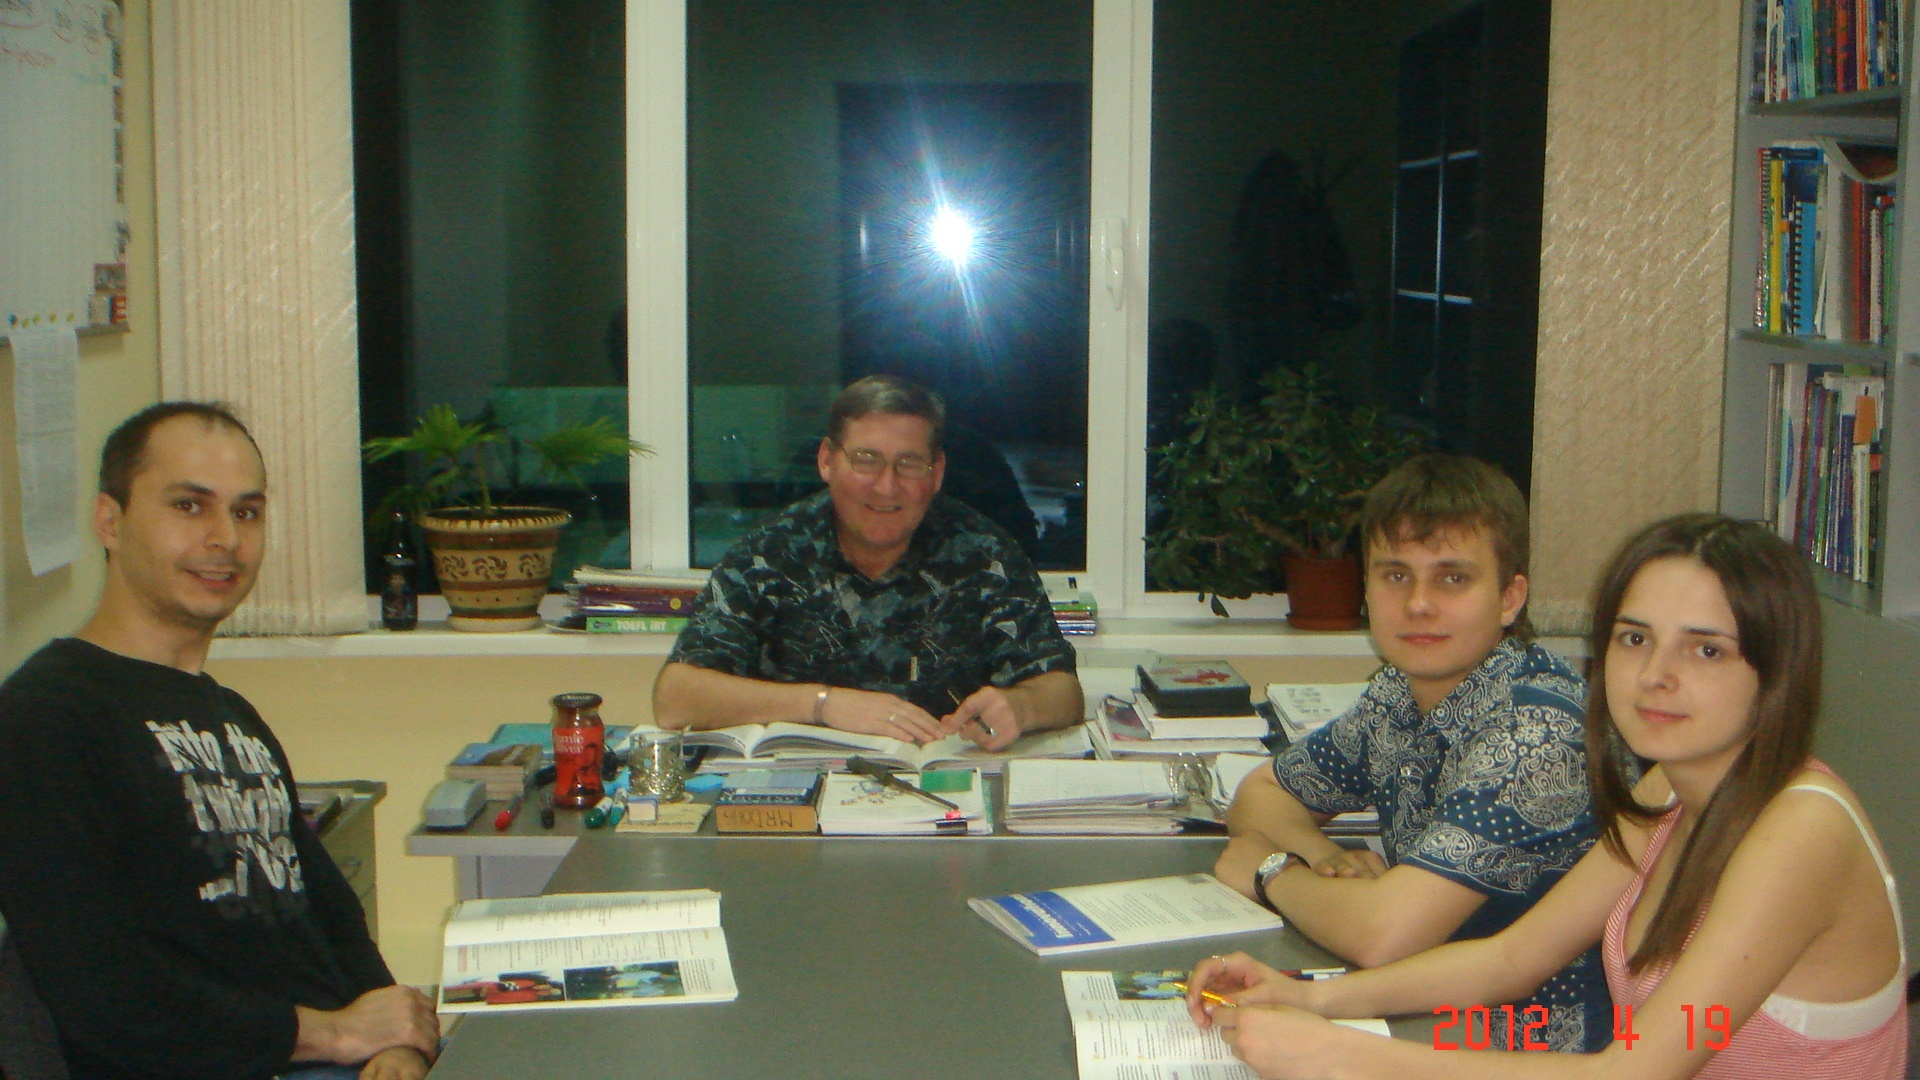 Корешков Никита,Запара Екатерина,Галусстьян Сергей